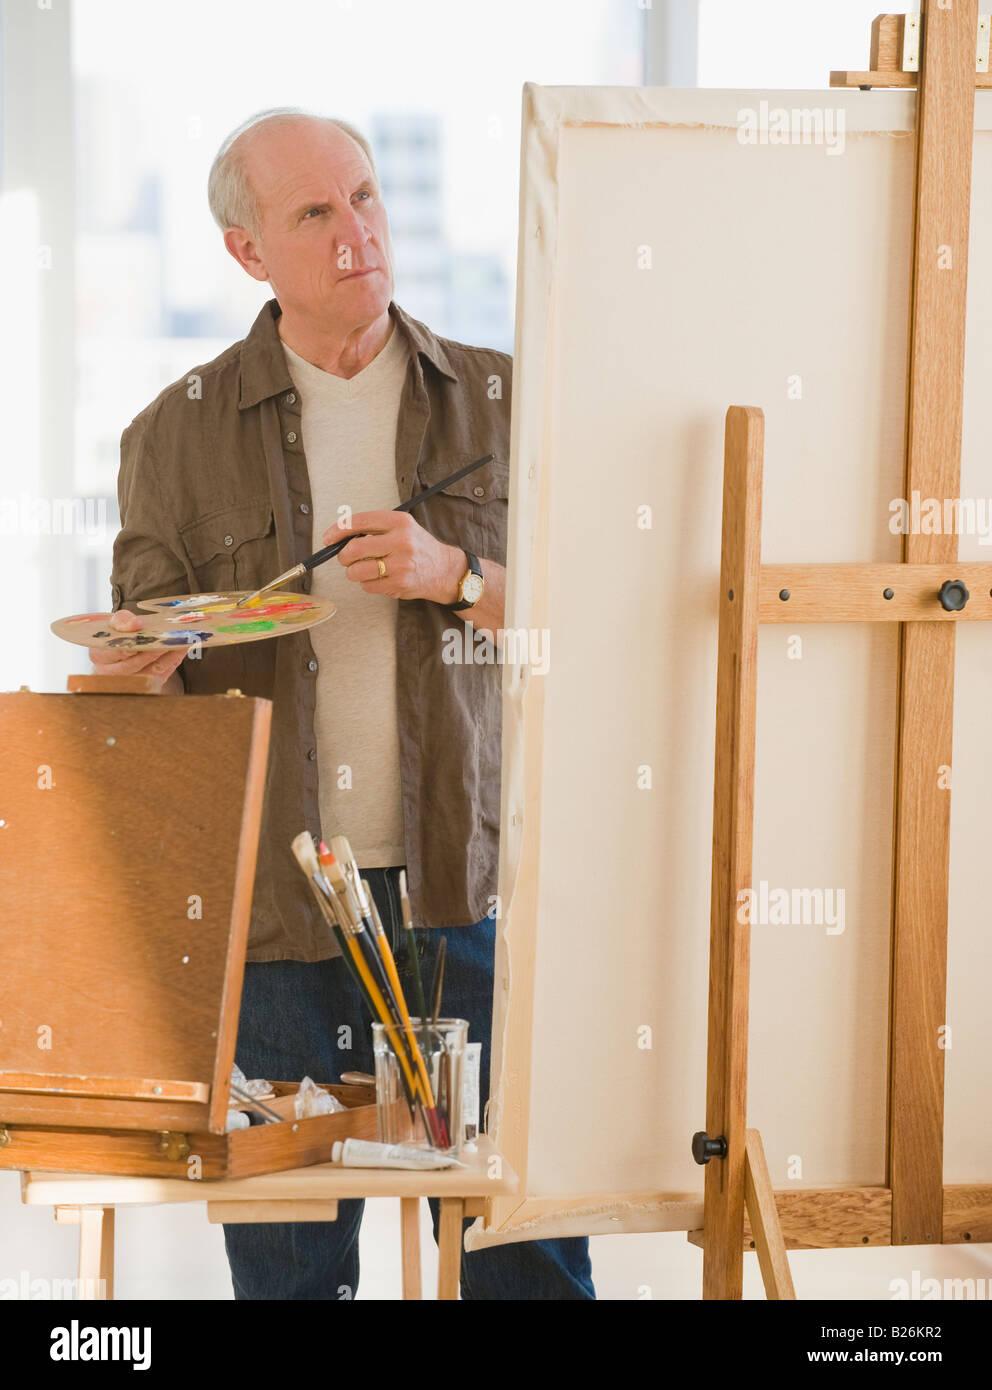 Senior man painting on easel Photo Stock